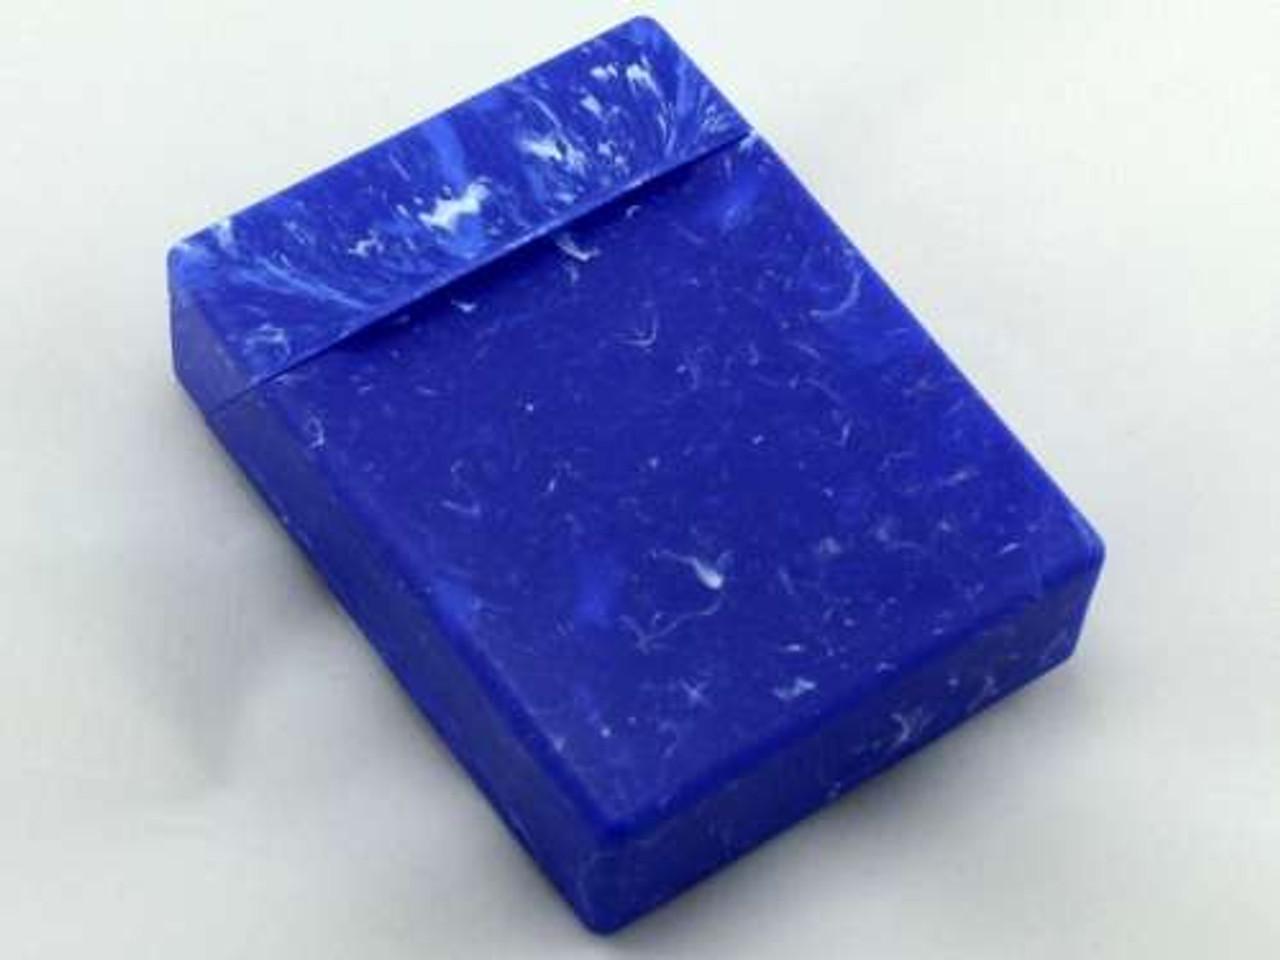 Blue Marble Cigarette Pack Holder